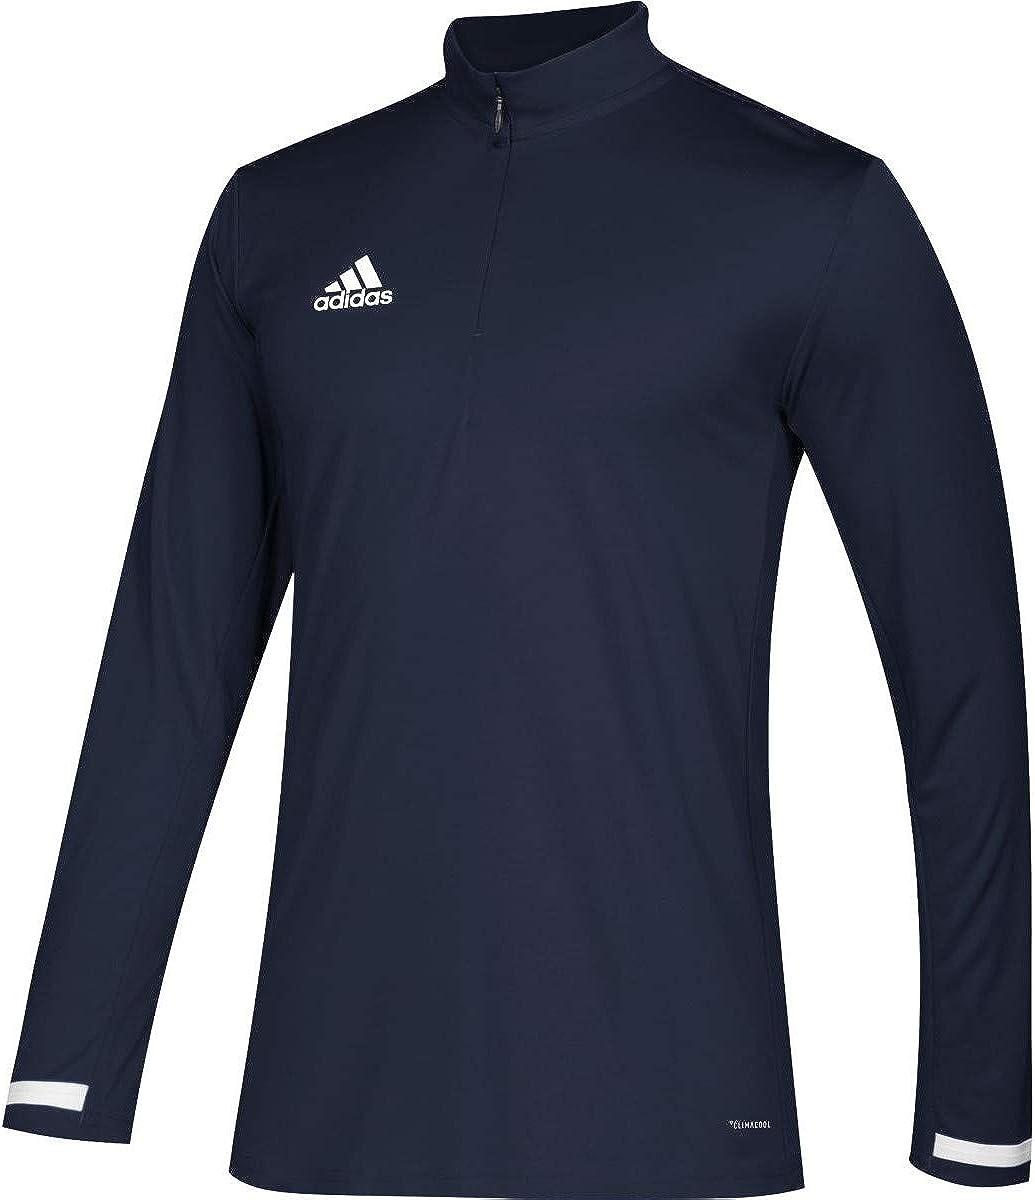 Amazon.com: adidas Male Team 19 1/4 Zip Long Sleeve Jersey ...